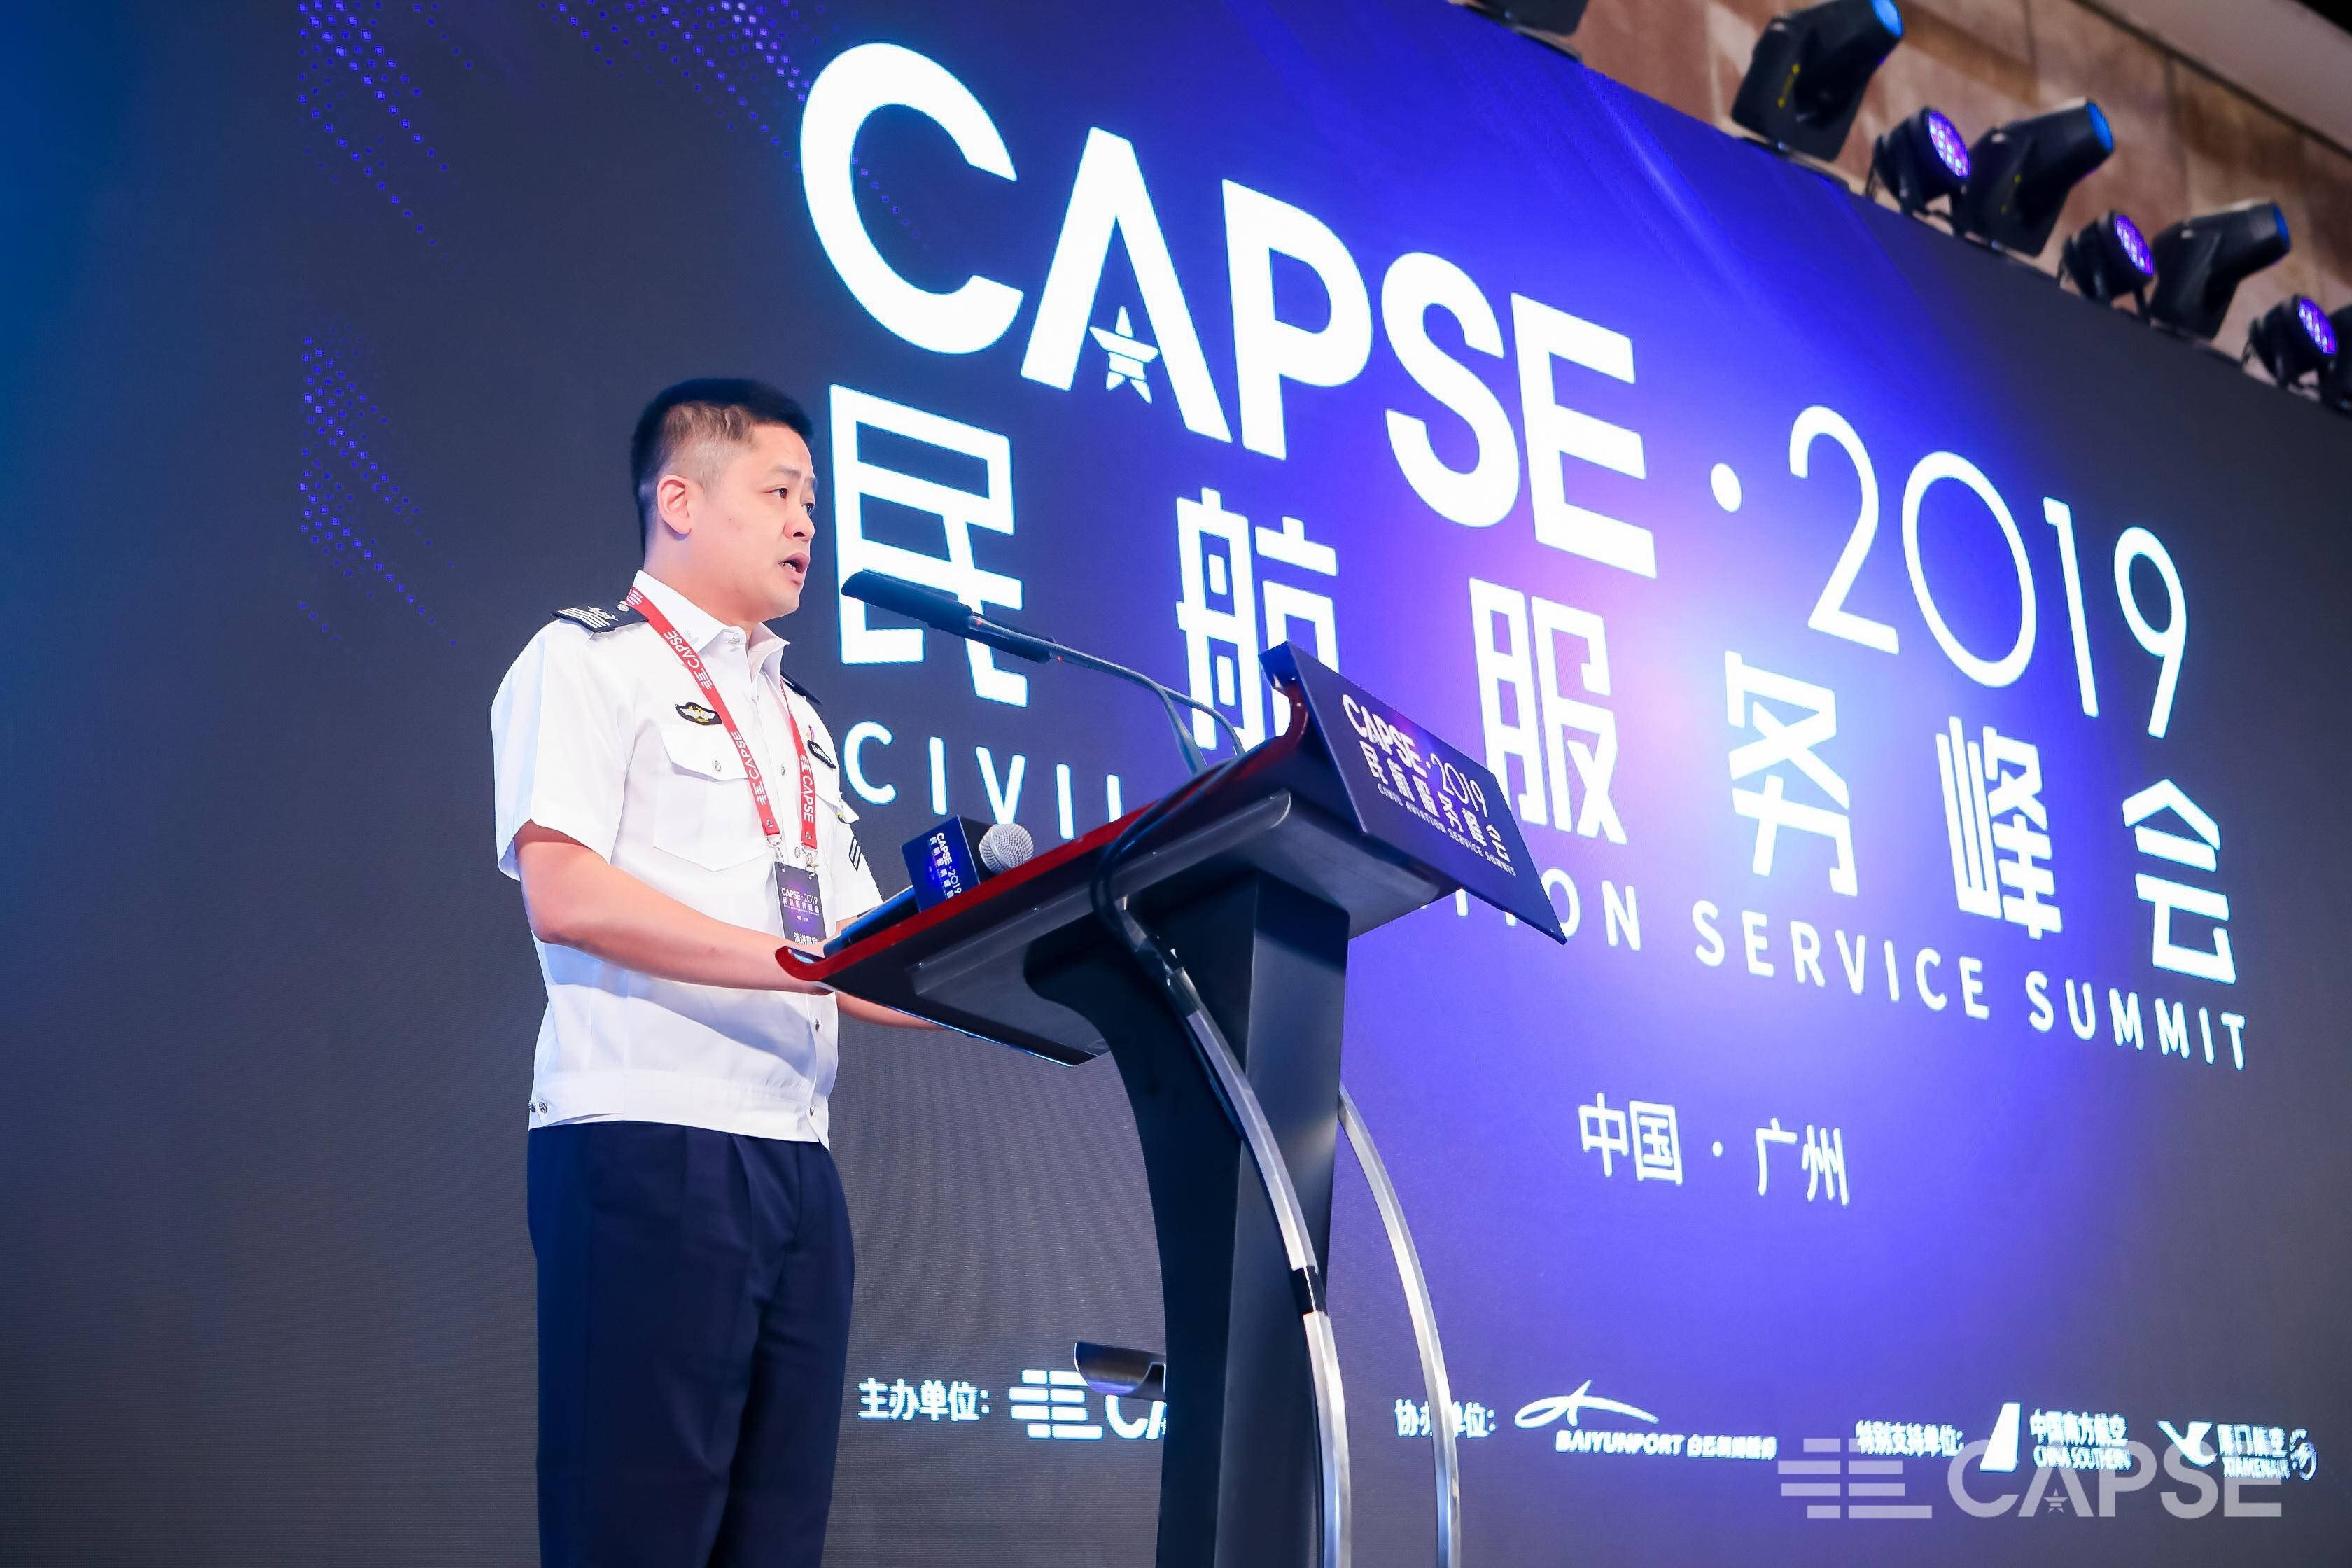 CAPSE民航服务峰会 人文安检--体验超预期过检服务